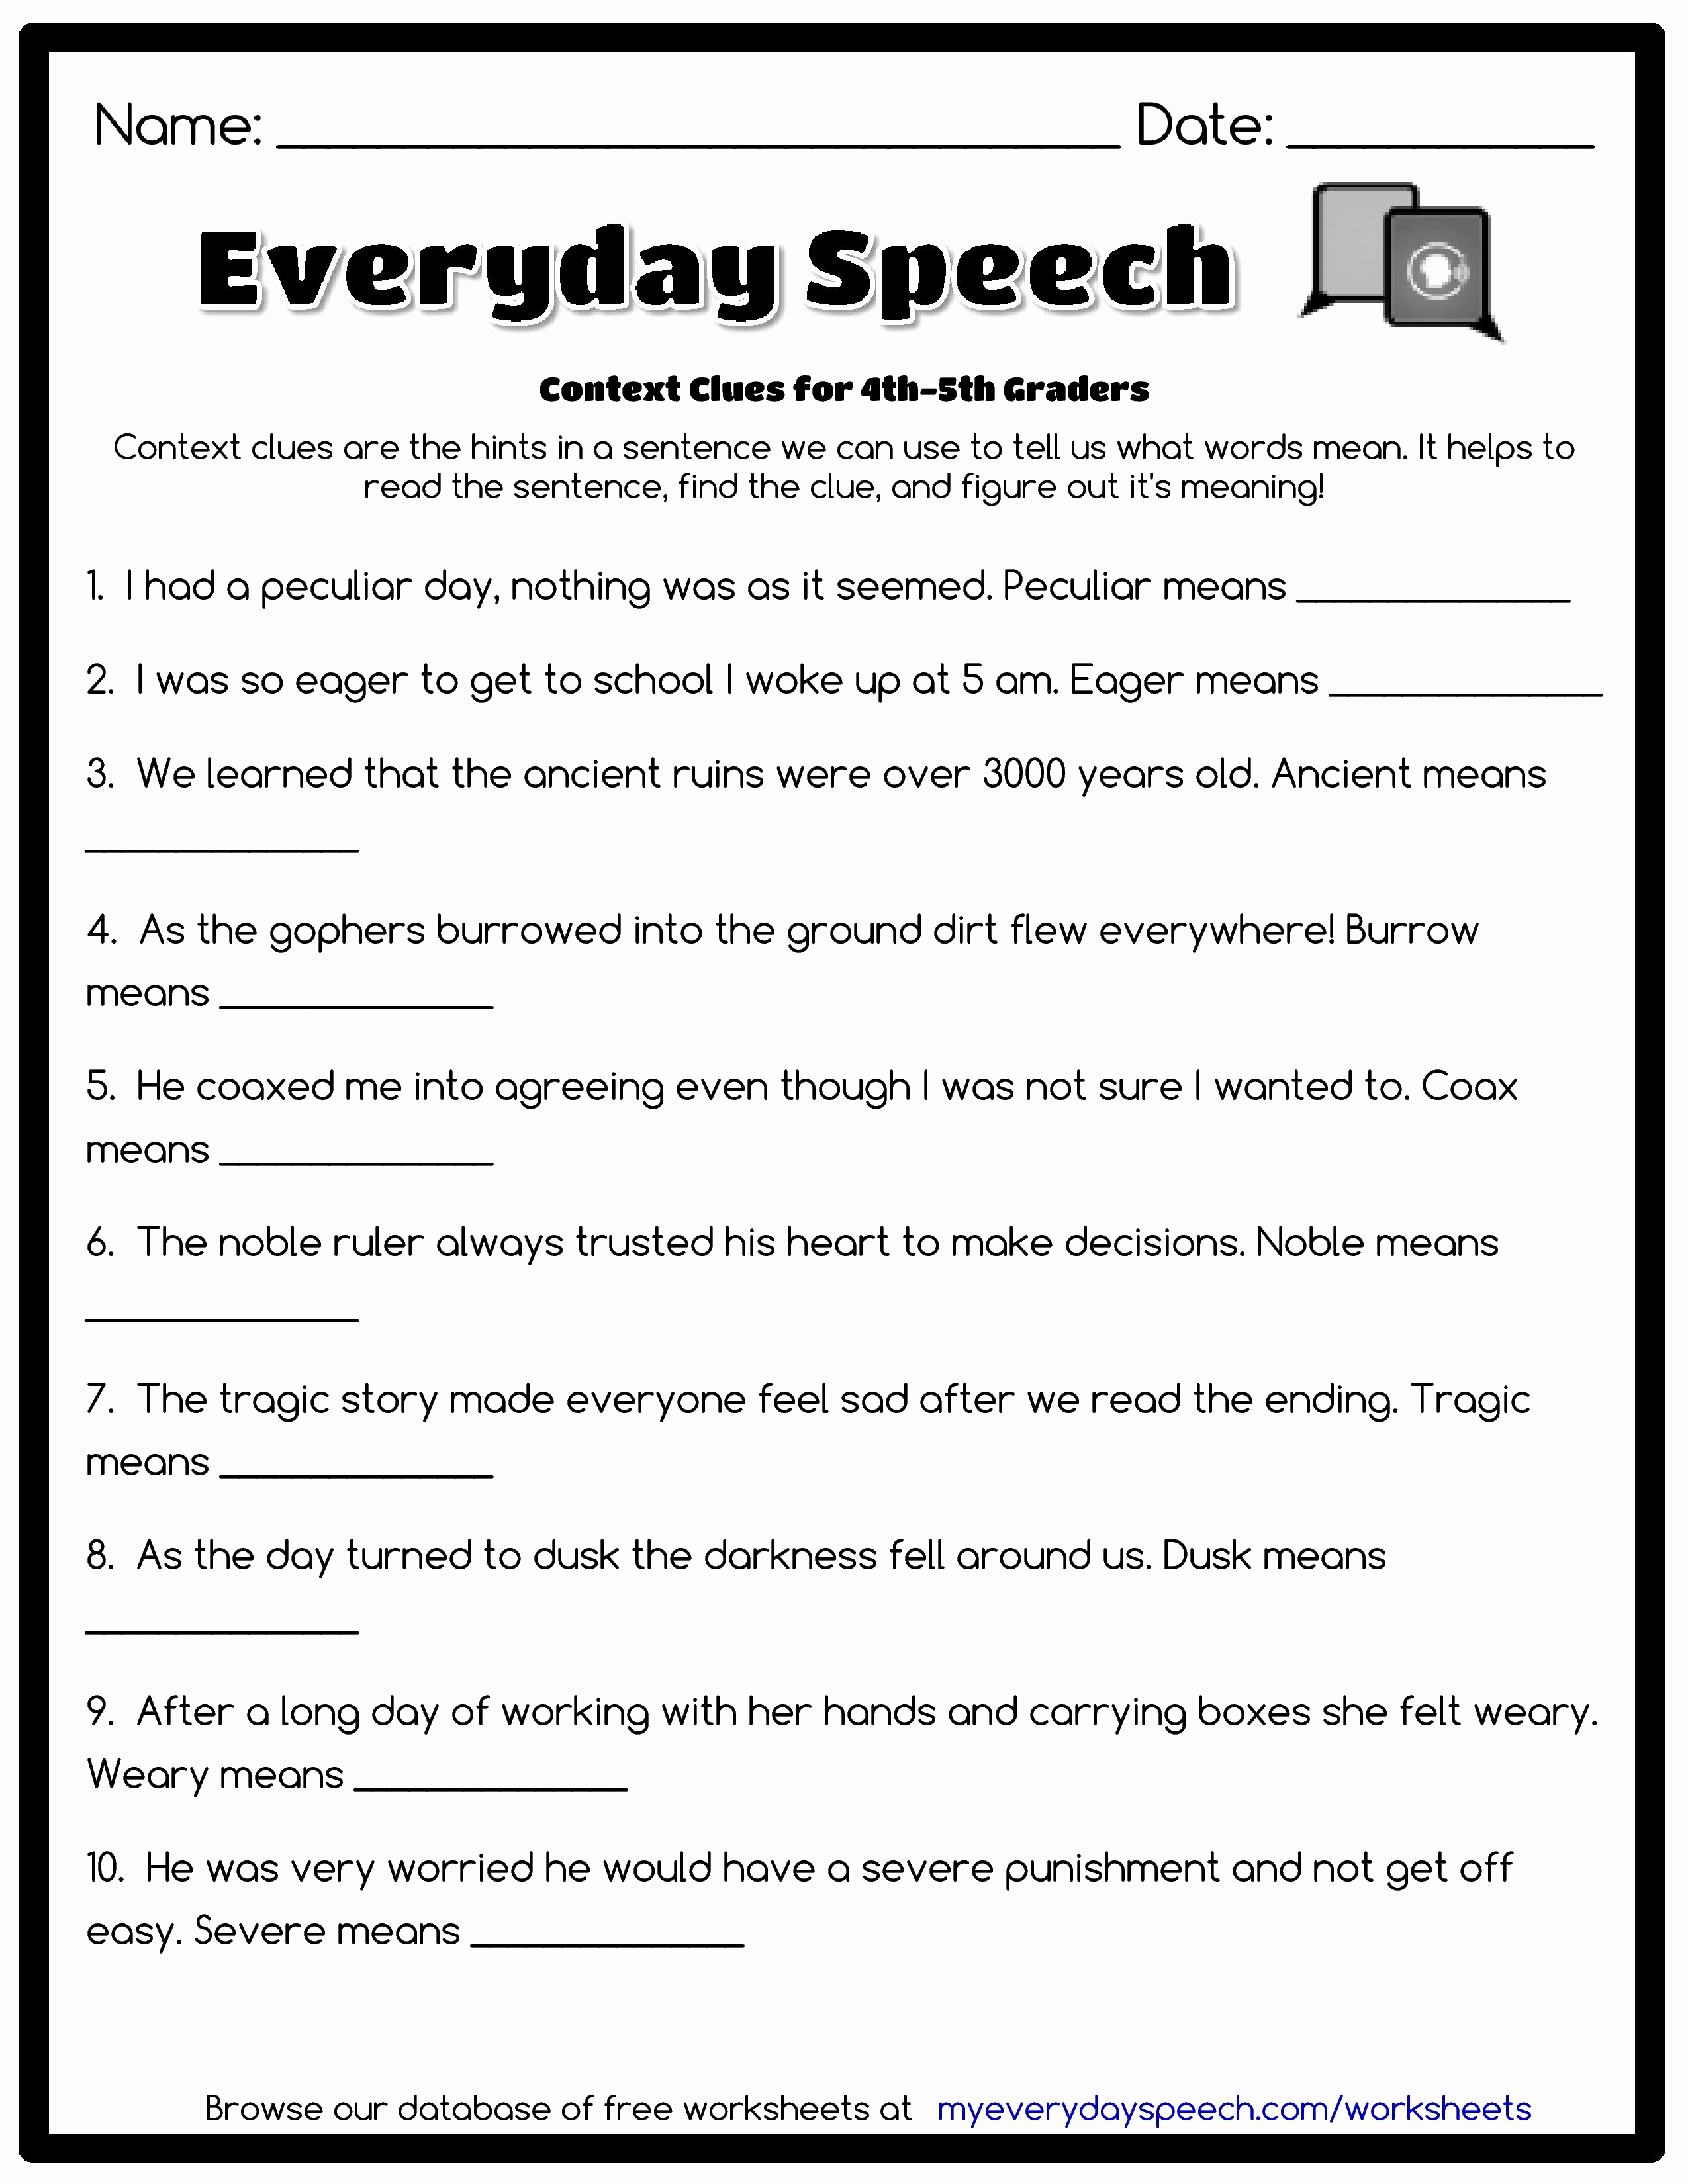 Grammar Worksheets Third Grade To Education - Math Worksheet For Kids - Free Printable Third Grade Grammar Worksheets